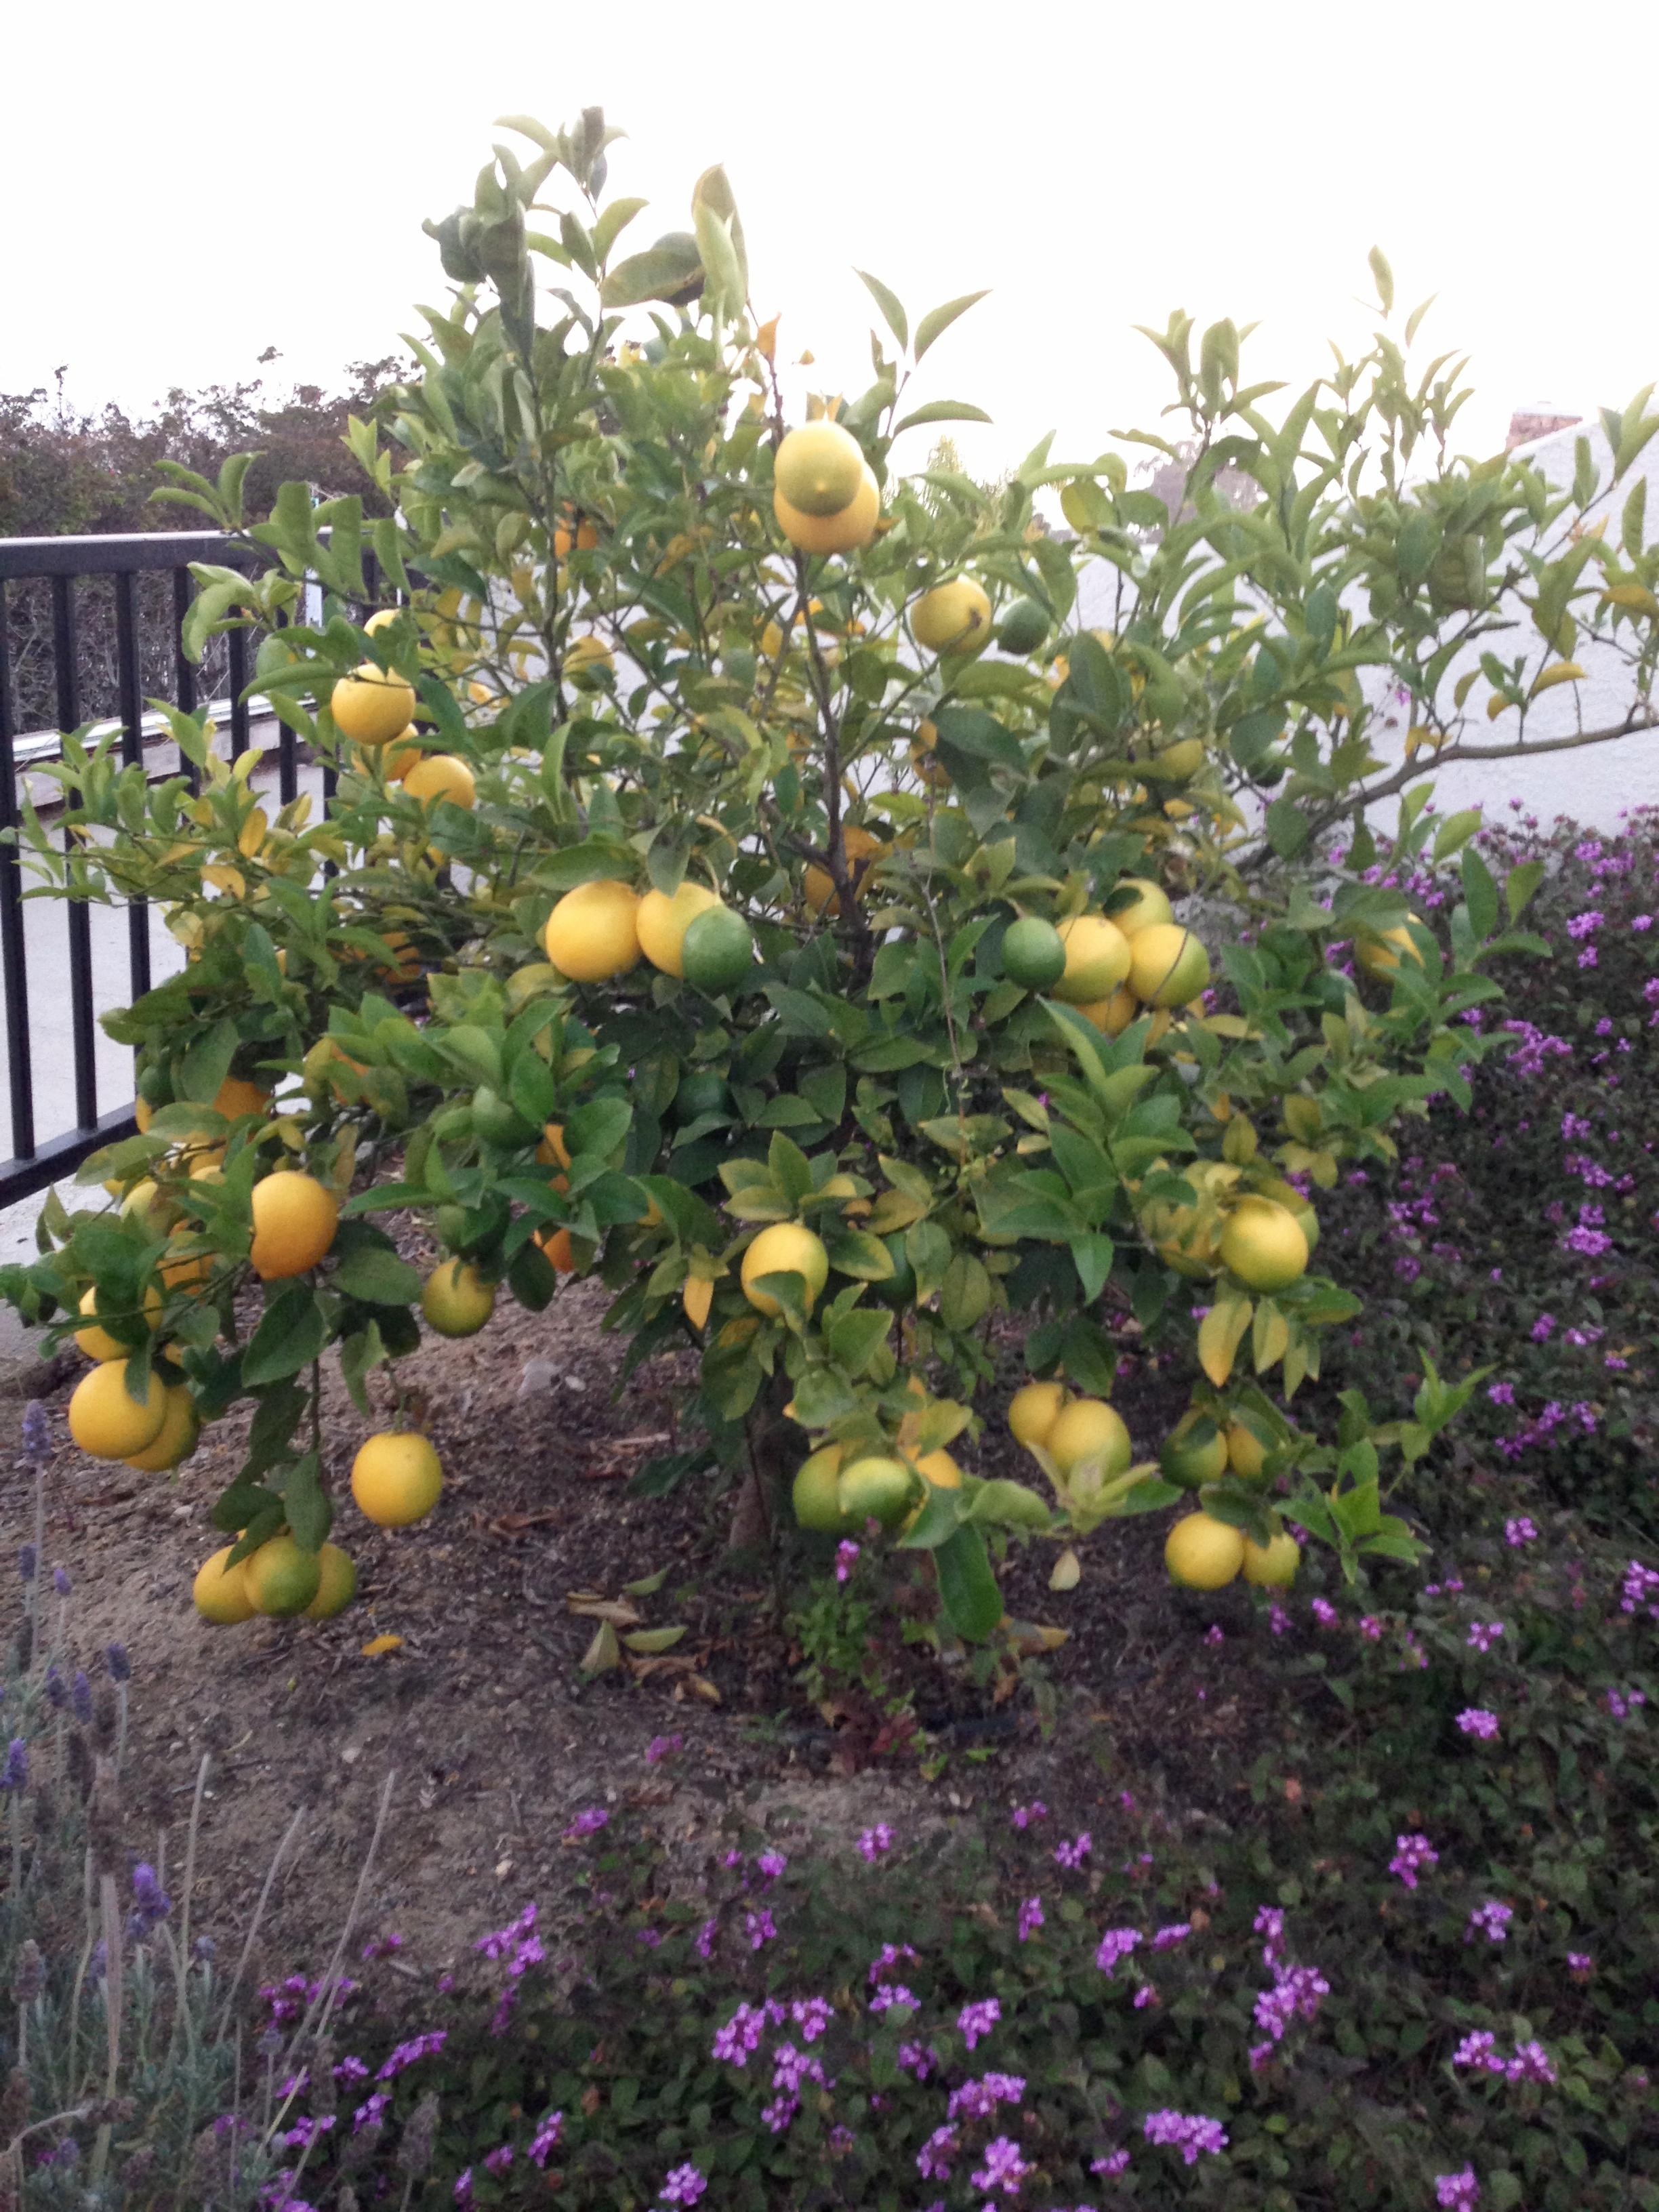 Image #12 - Ventura house - Lemon tree.JPG